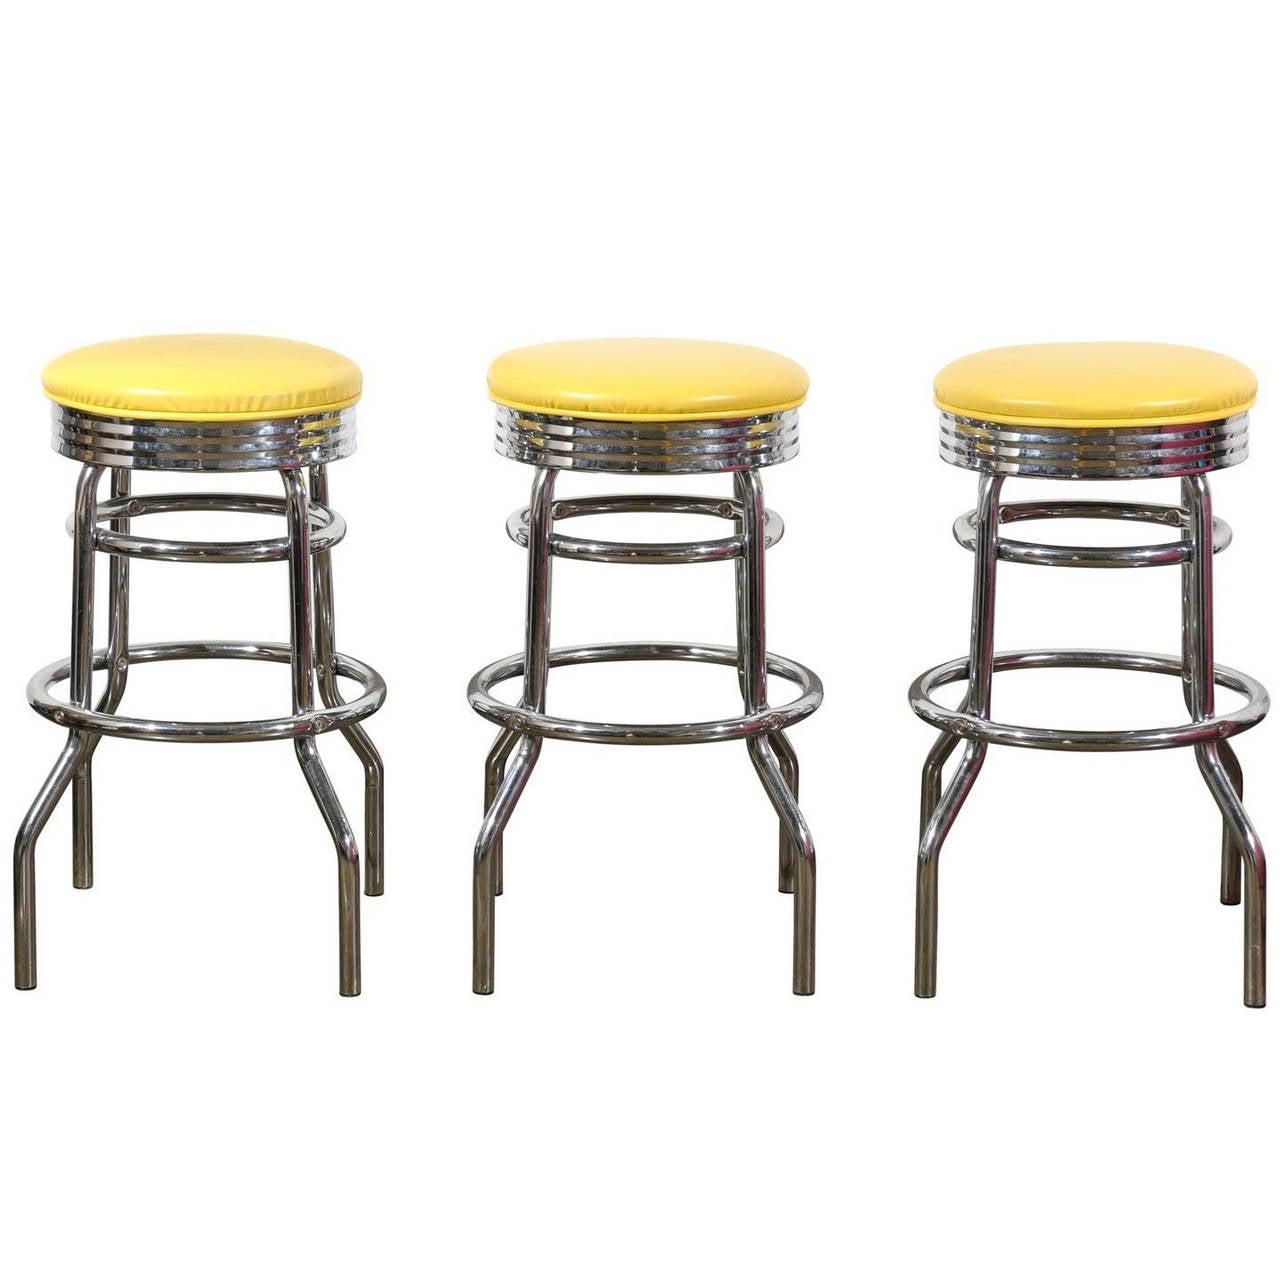 set of three swivel bar stools at 1stdibs. Black Bedroom Furniture Sets. Home Design Ideas